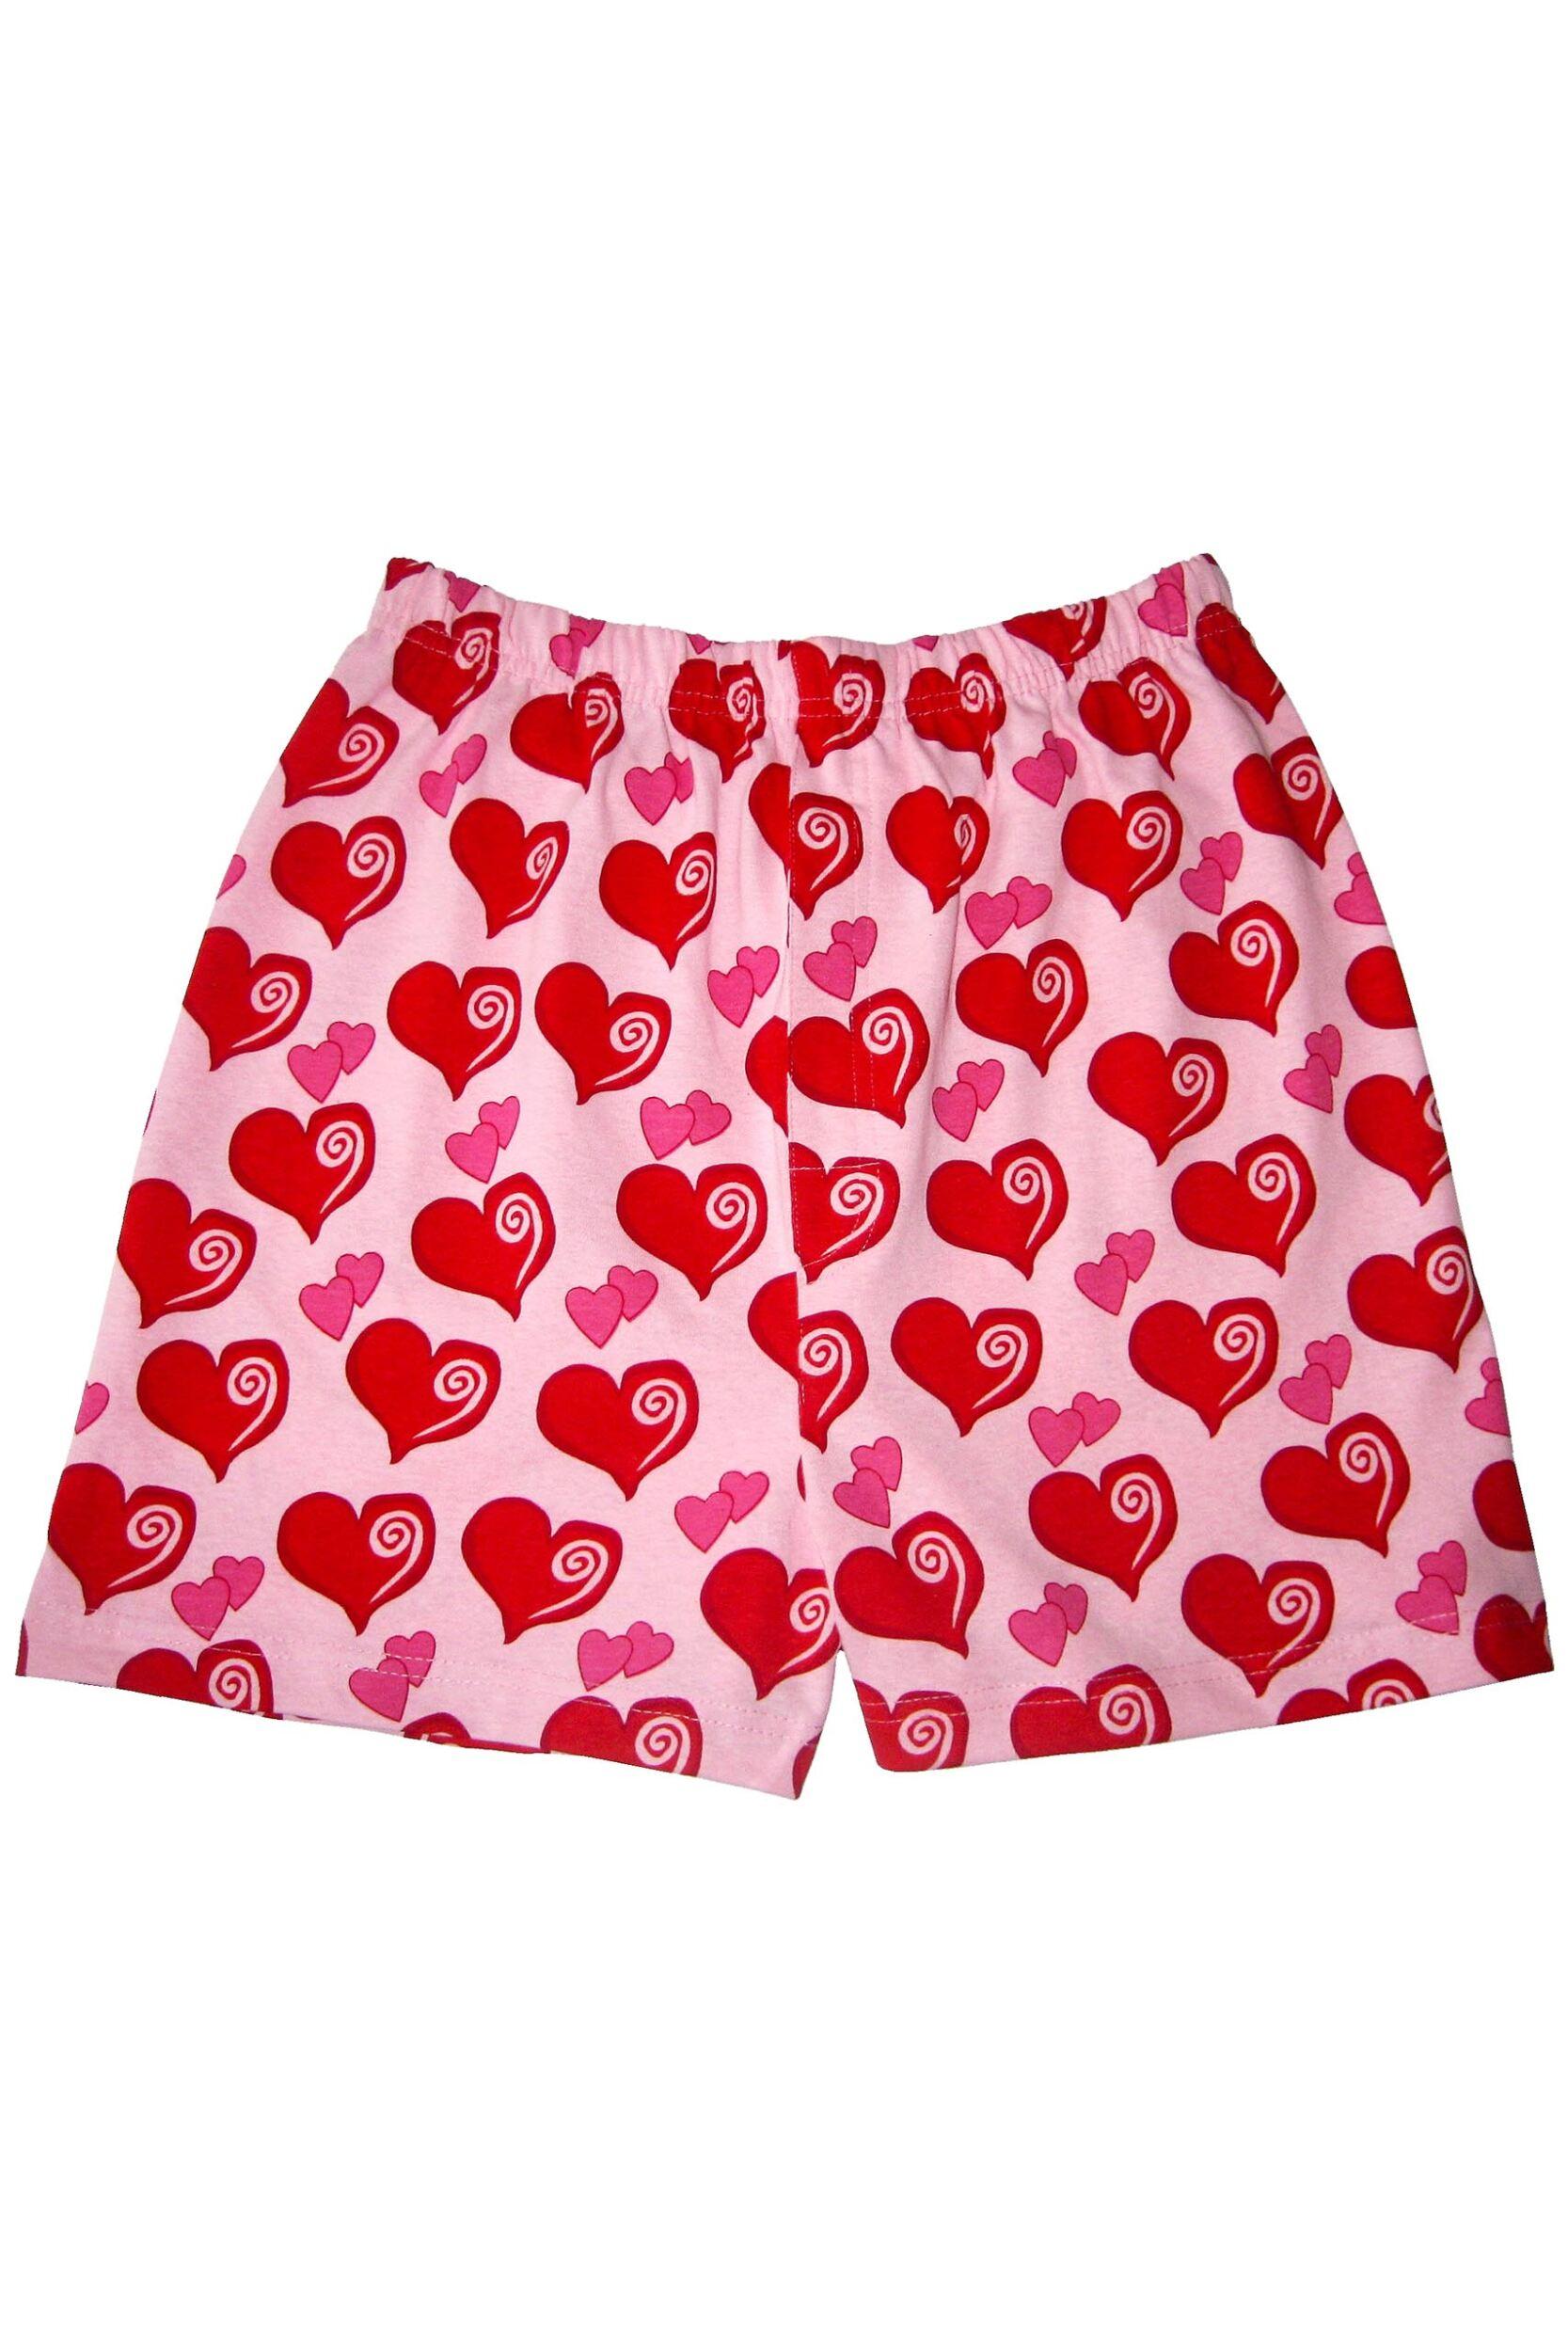 Mens 1 Pair Magic Boxer Shorts In Heart Pattern